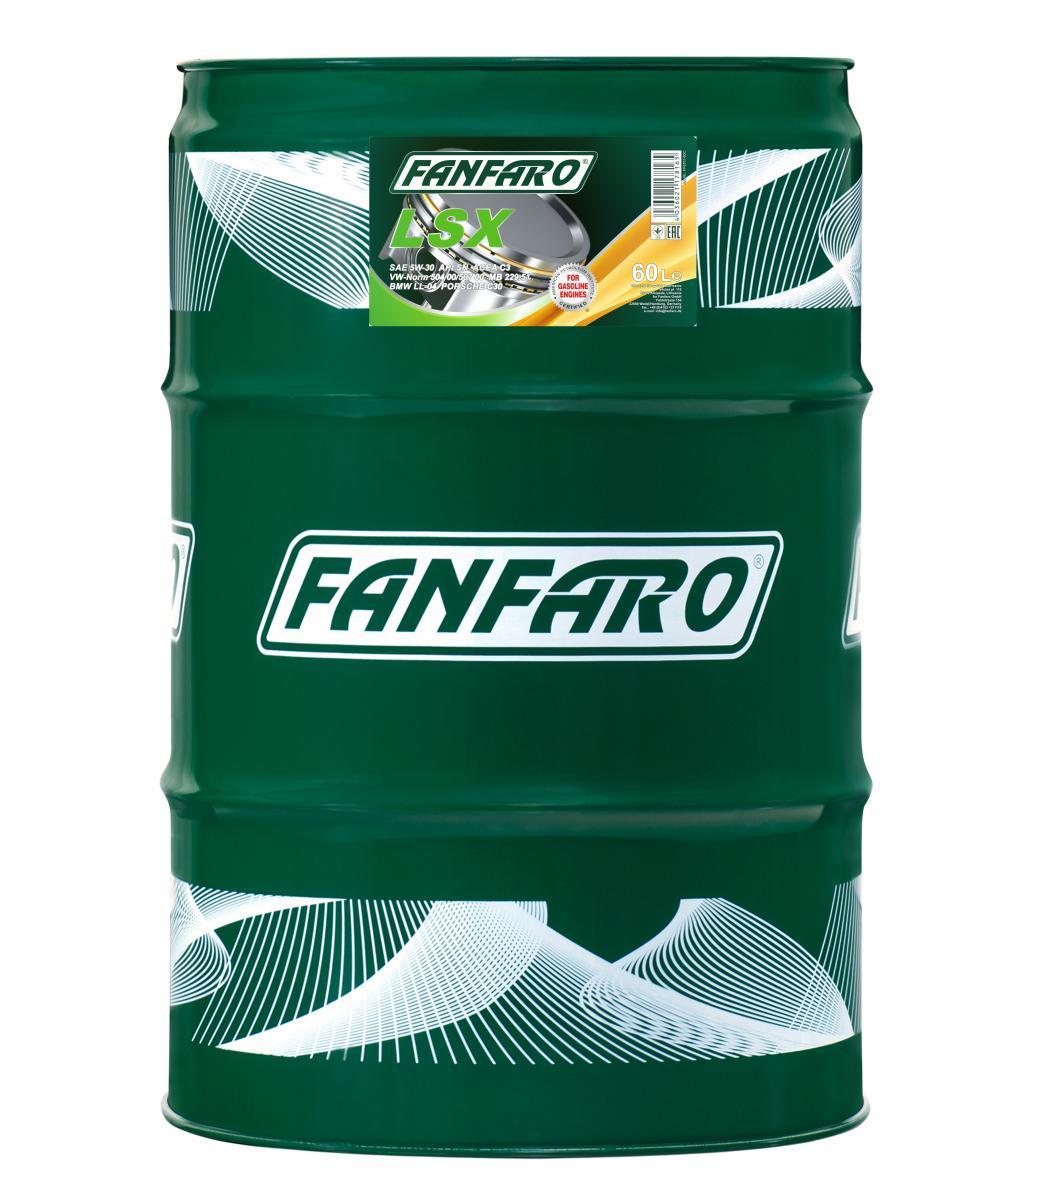 FF6701-60 FANFARO Expert Line, LSX 5W-30, 60l Motoröl FF6701-60 günstig kaufen